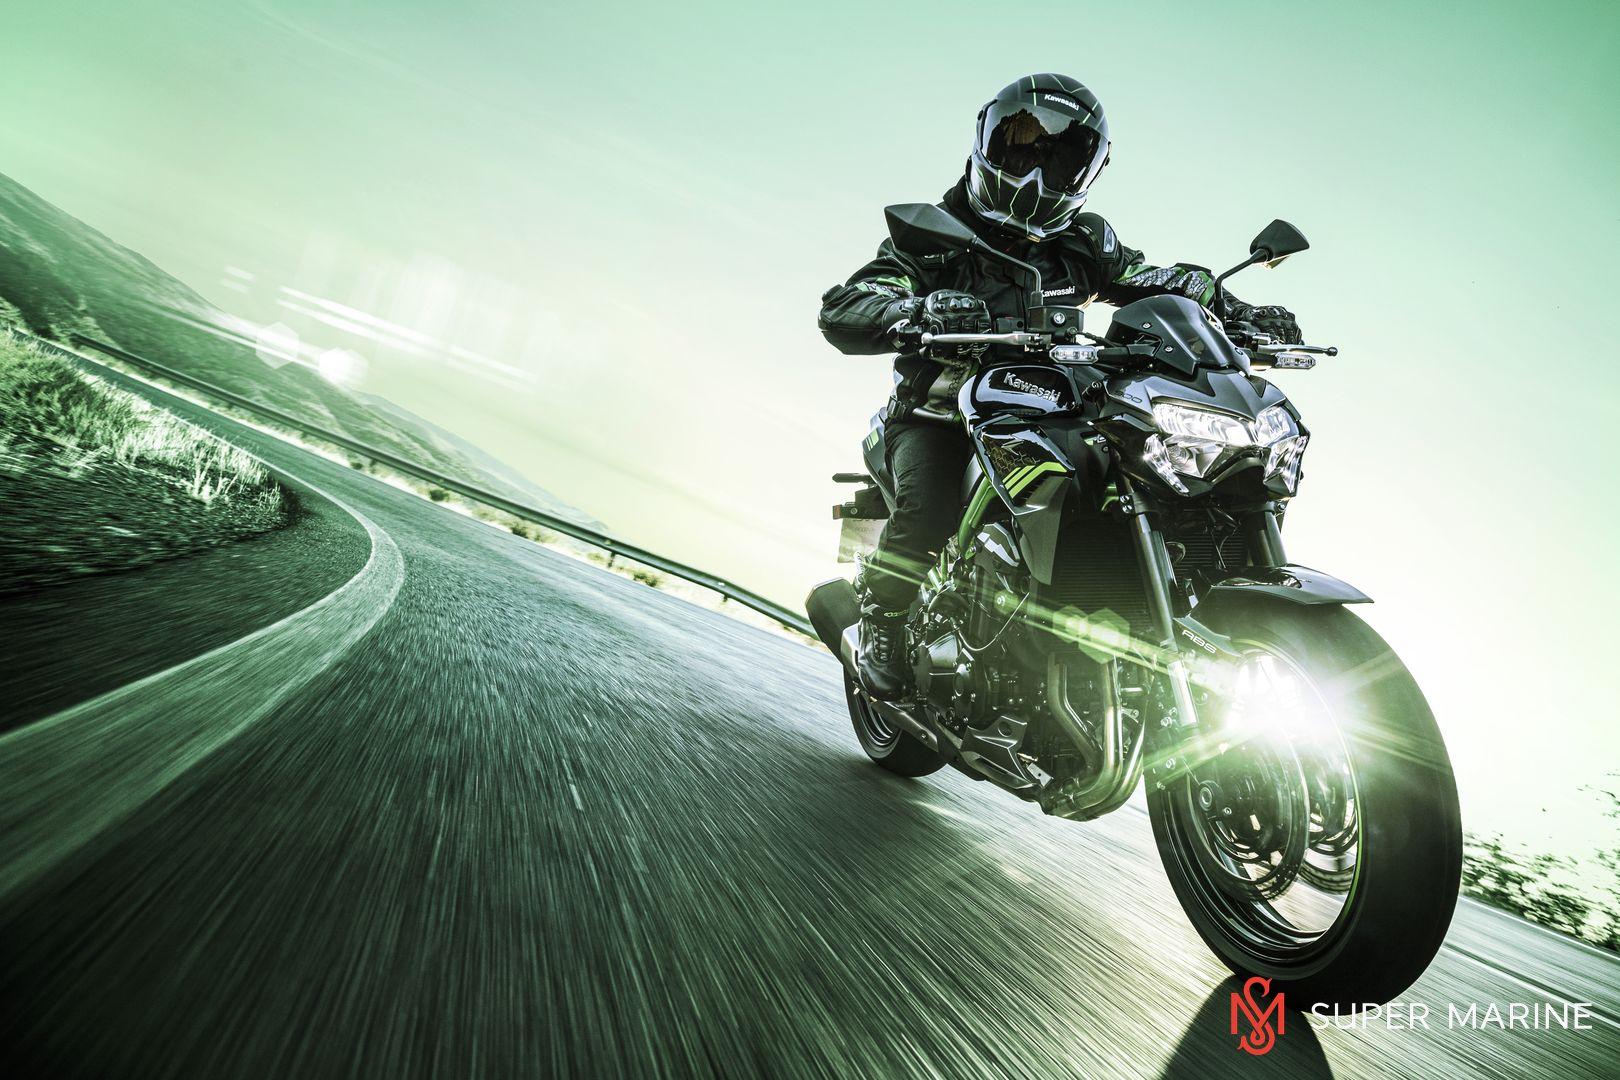 Мотоцикл Kawasaki Z900 ABS Чёрный 2020 - 8